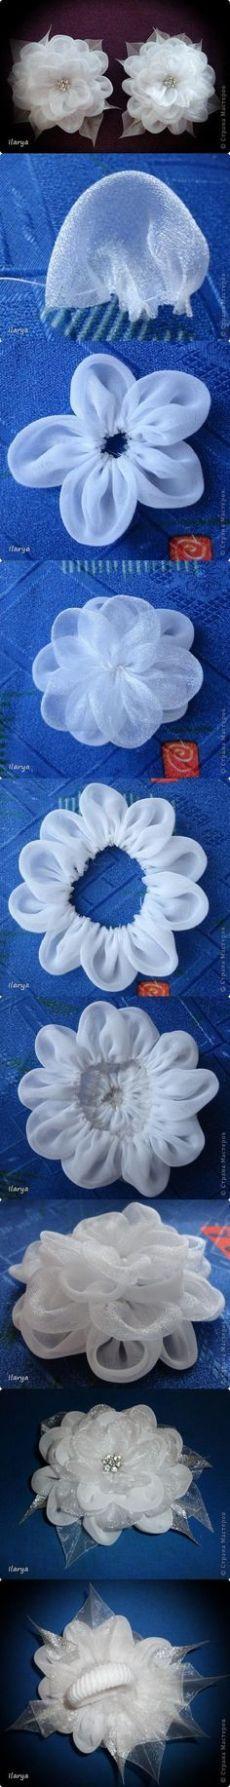 Fabric flower tutorial- sheer beauty